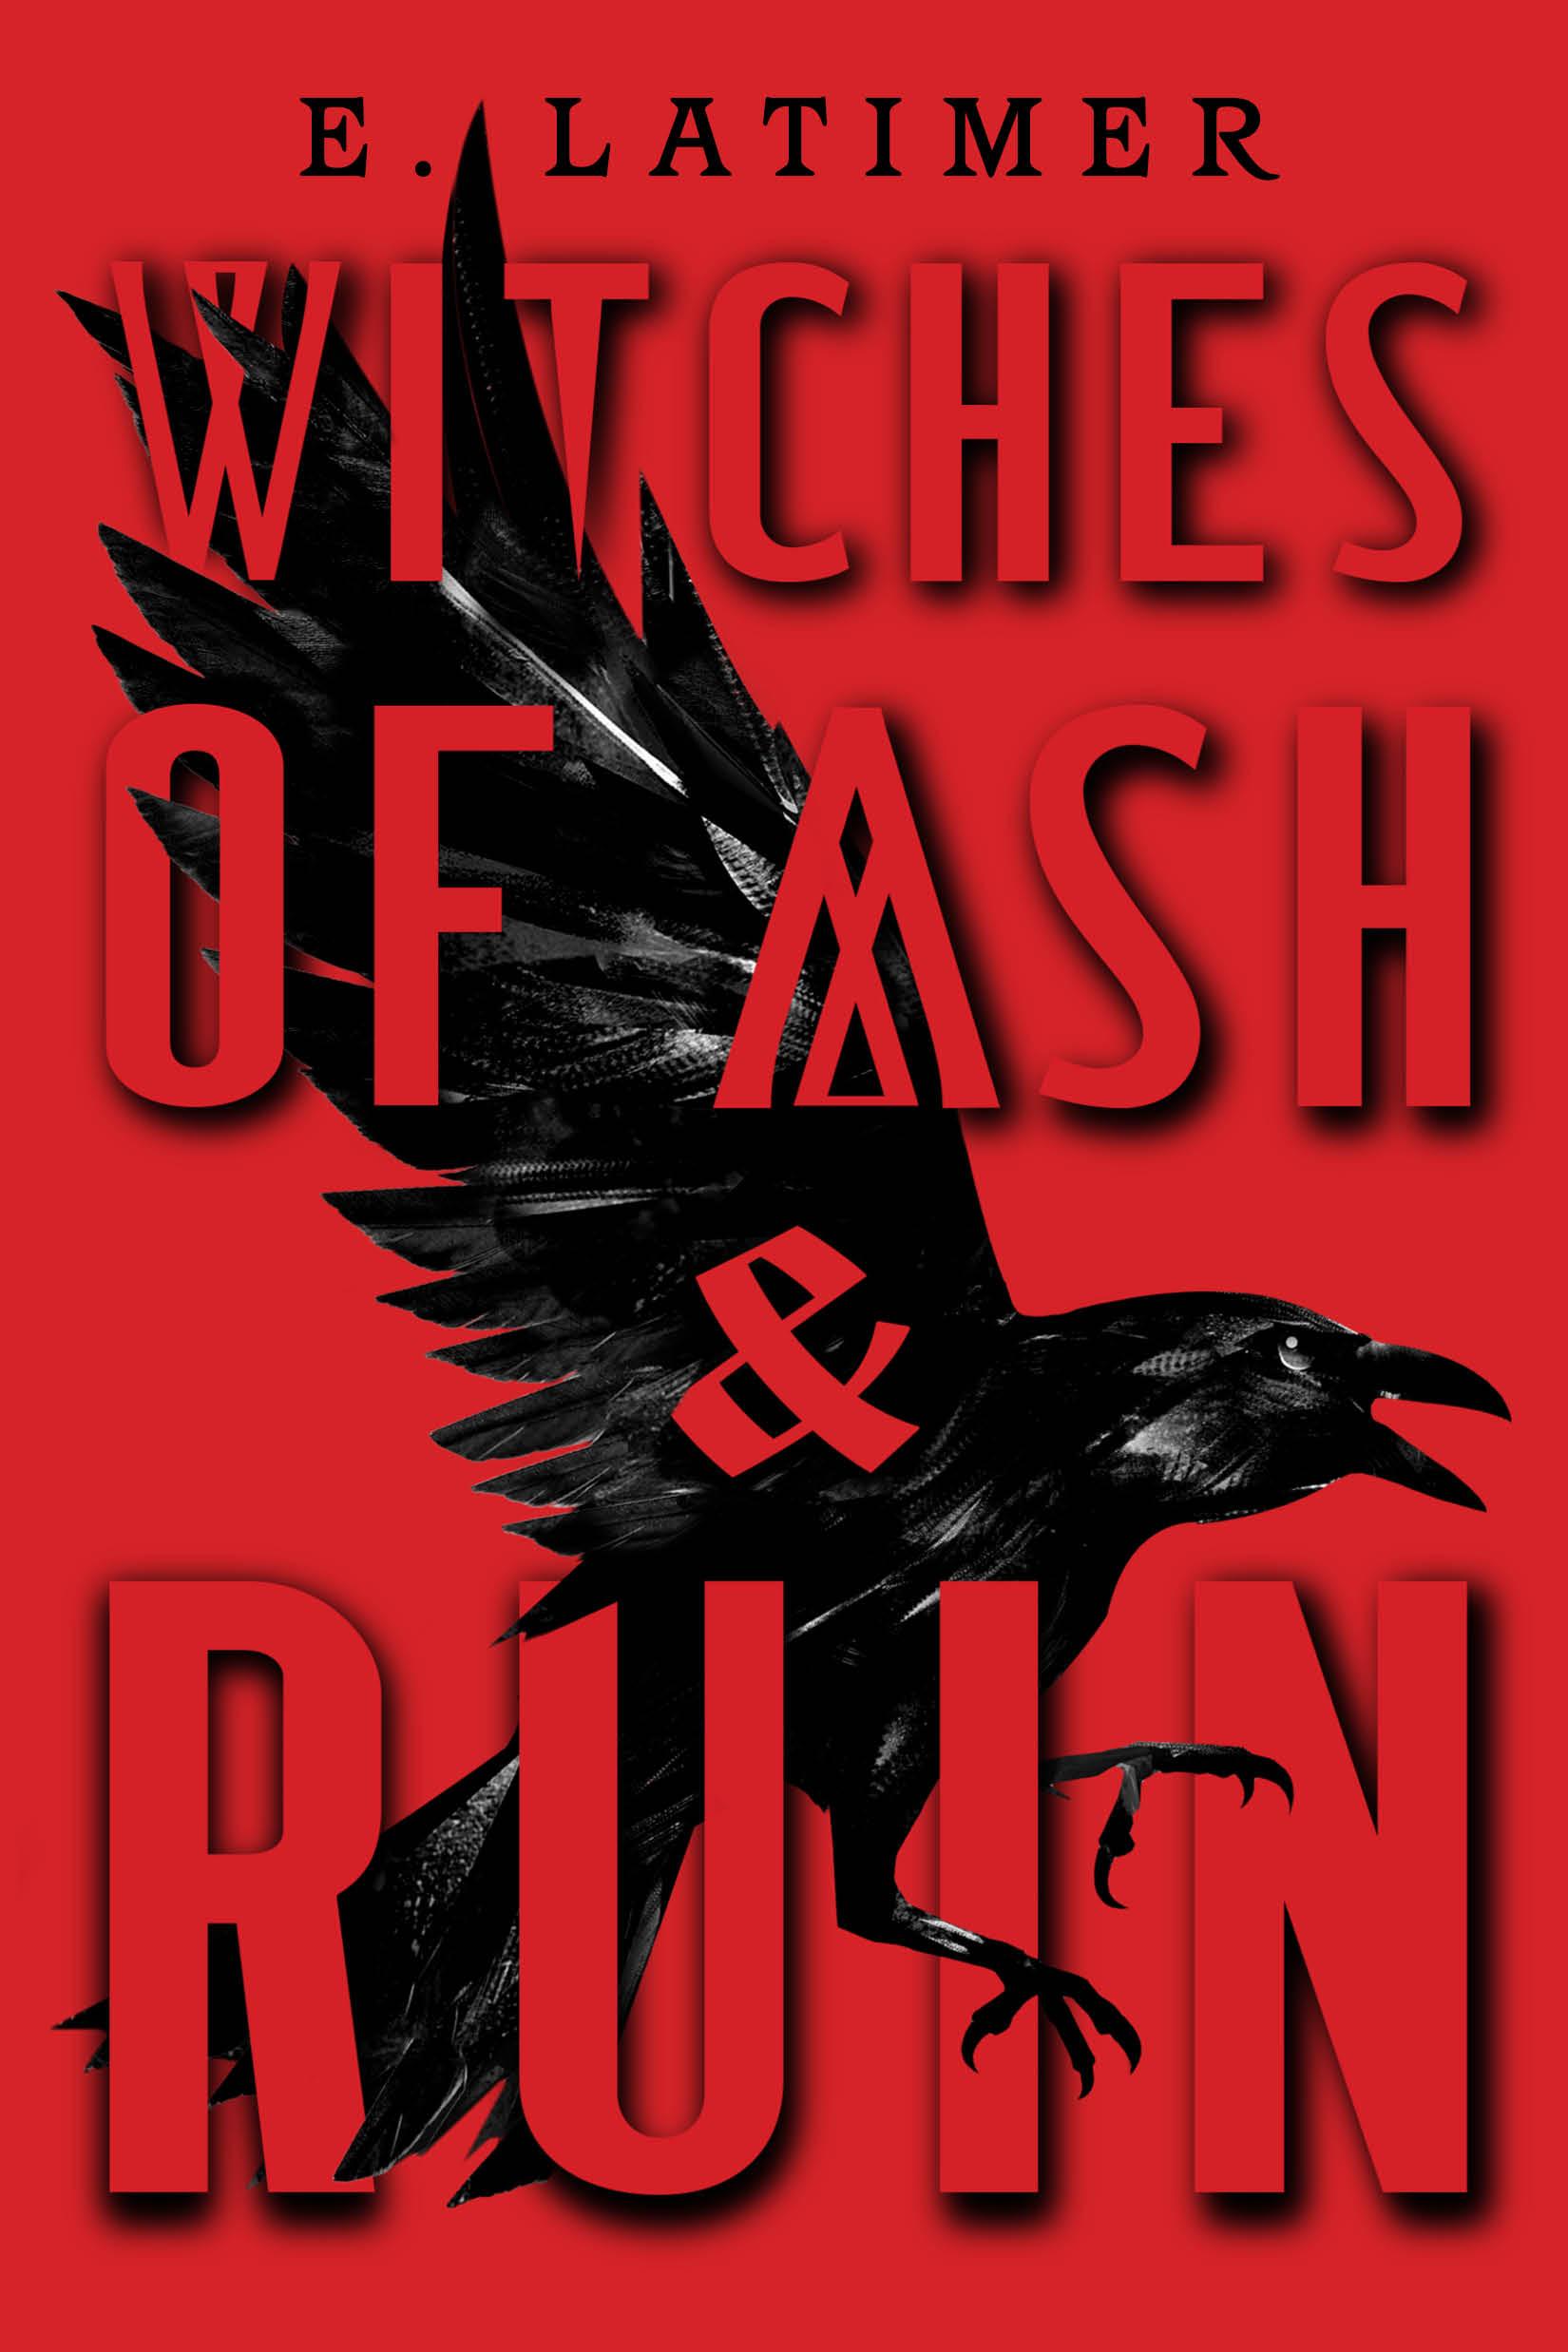 Resultado de imagen de Witches of Ash and Ruin by E. Latimer book cover